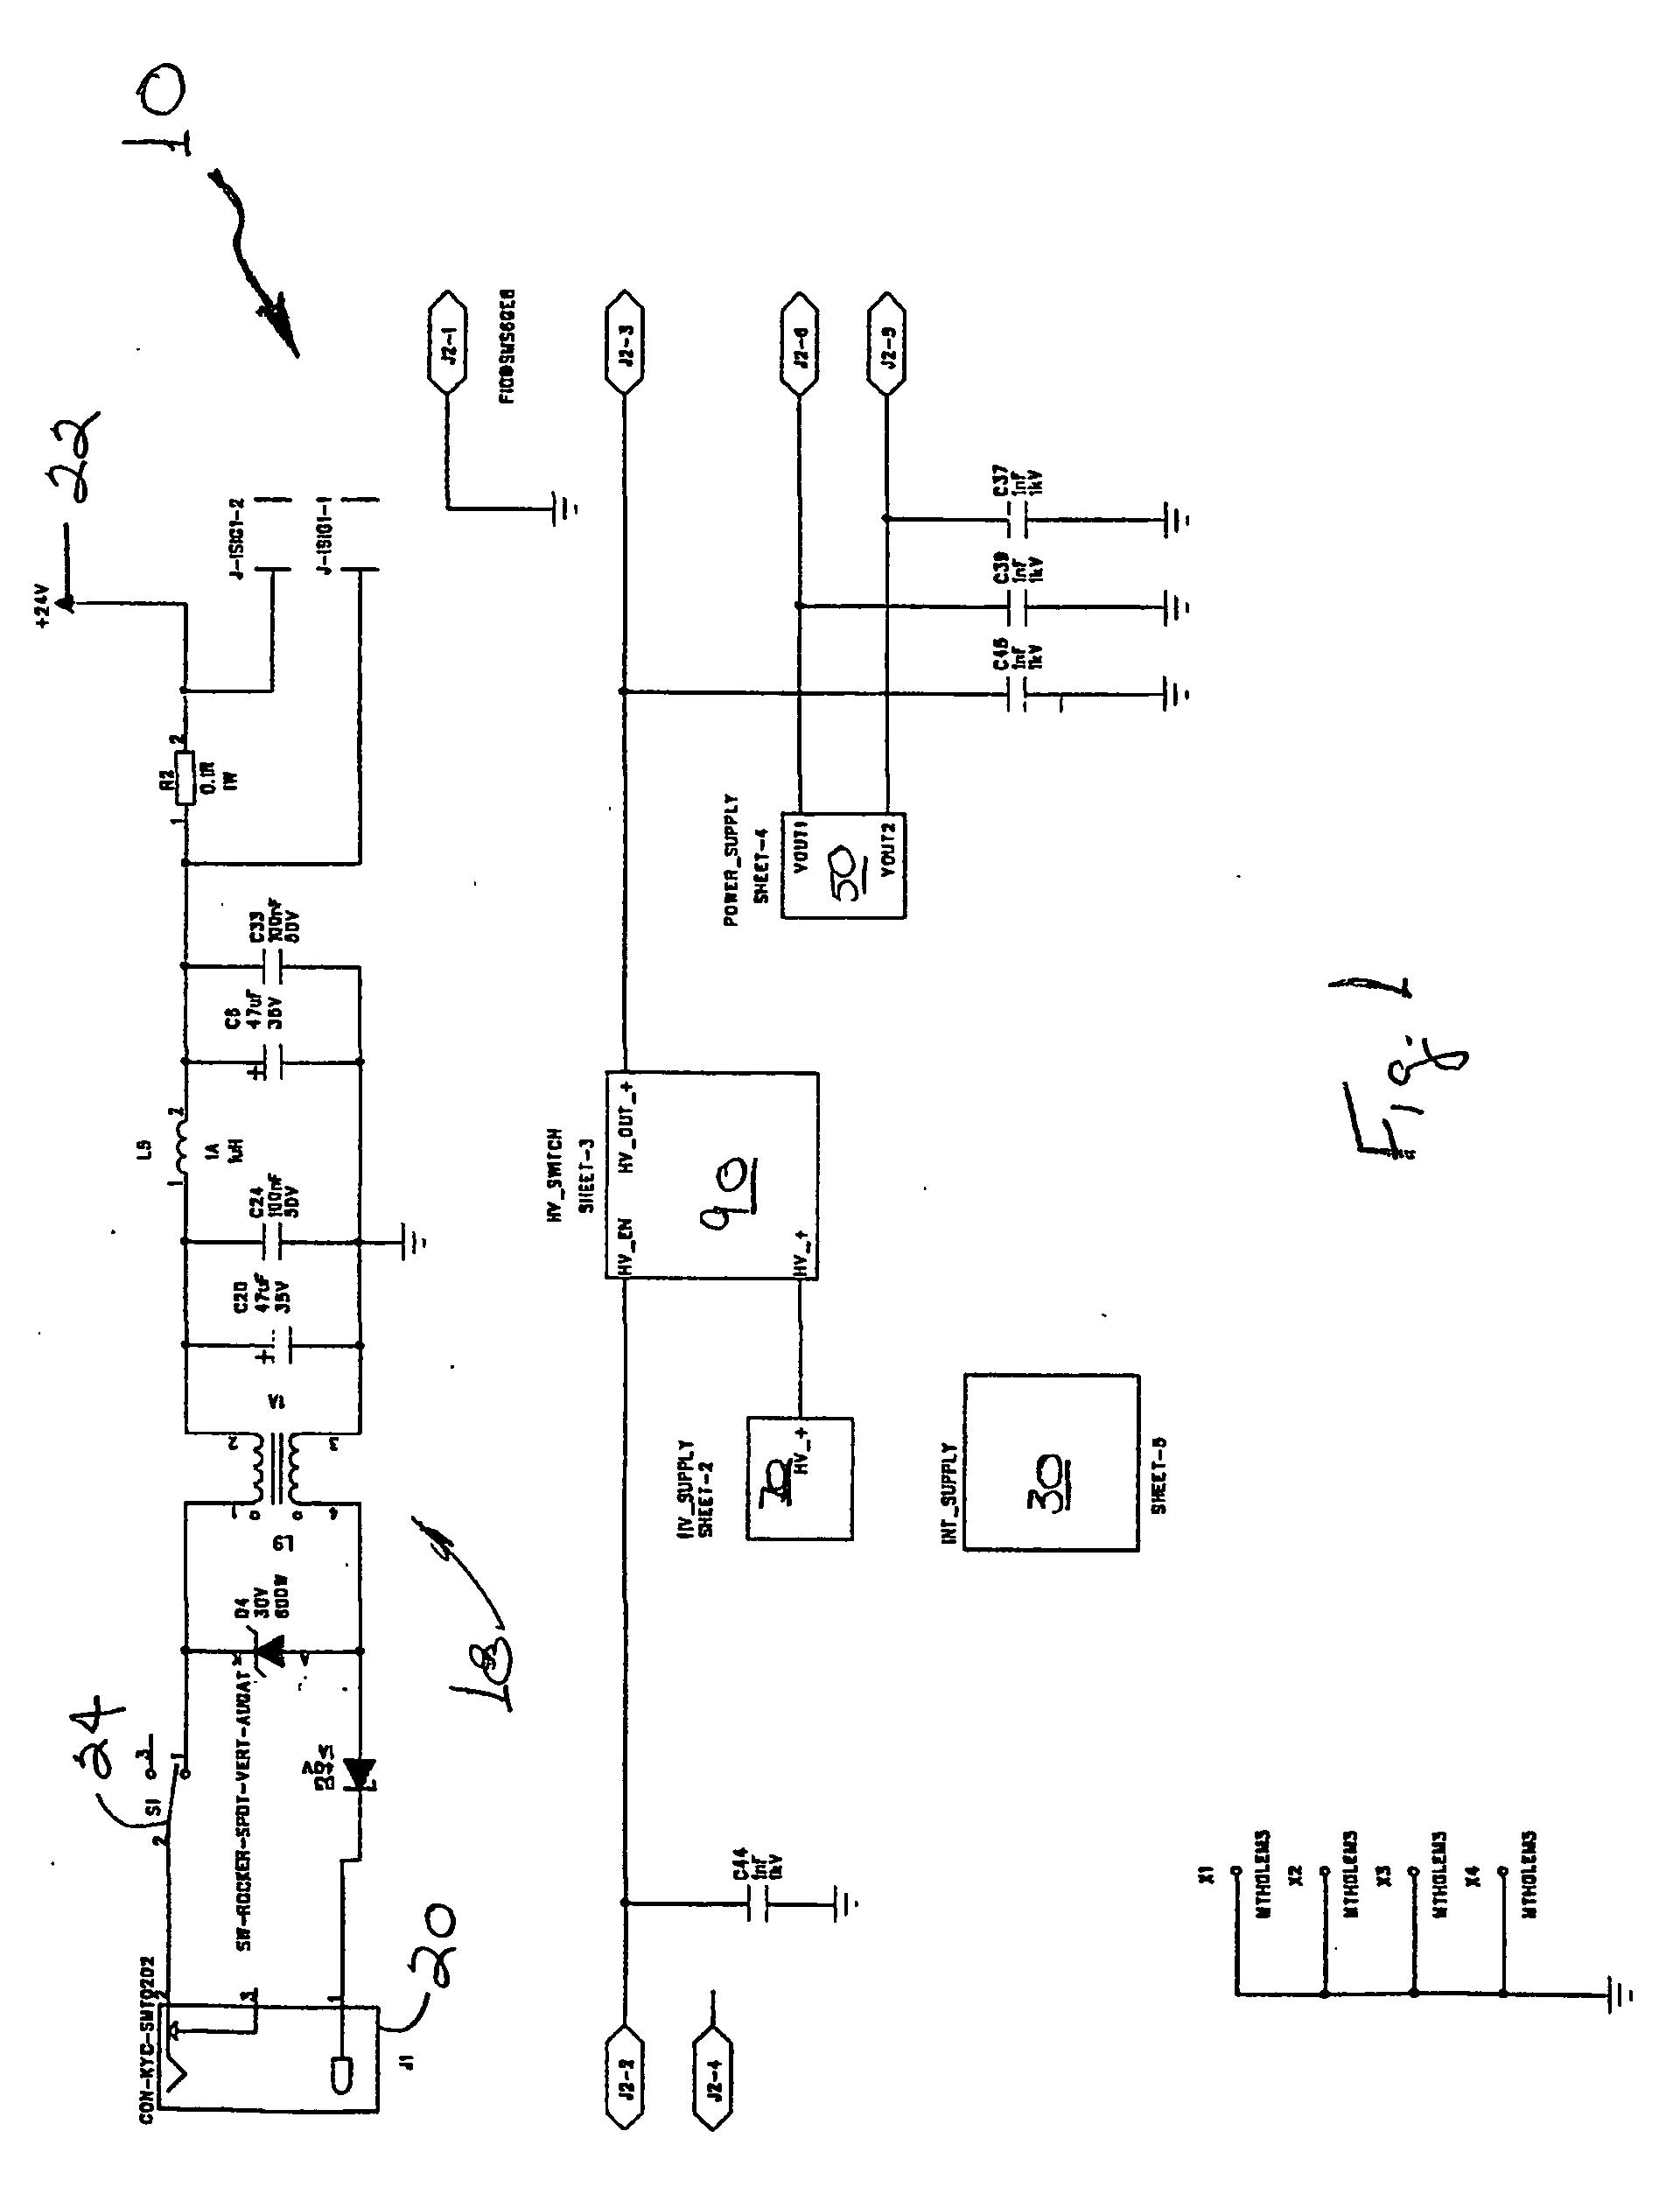 Patent Us20060097180 Switching Depolarizing Power Supply For A 5v 3a Regulator Switchingregulatorcircuit Powersupplycircuit Drawing